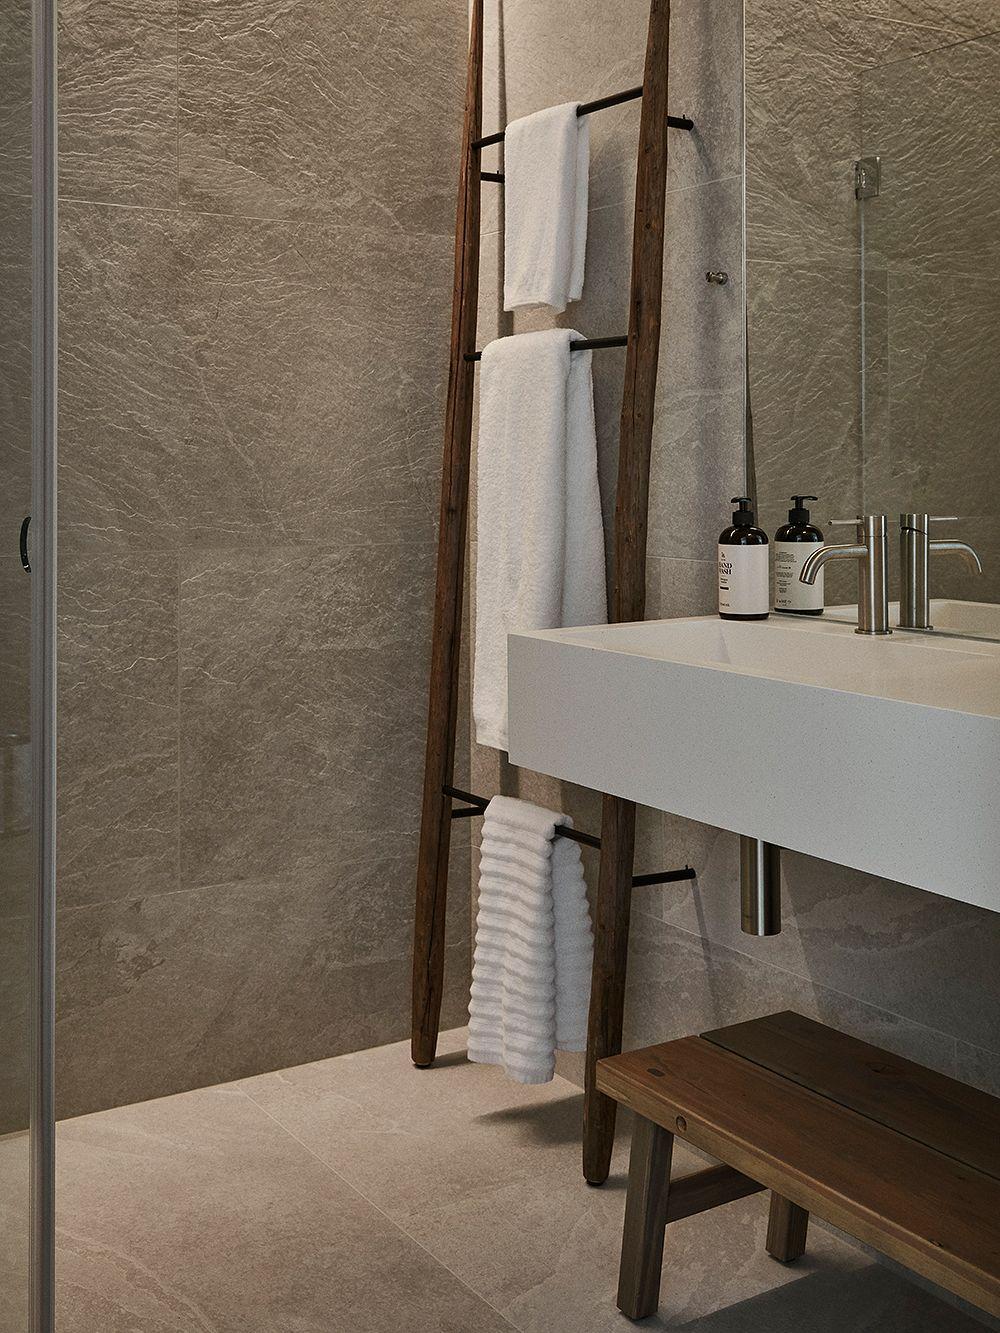 Runo-hotellin kylpyhuone